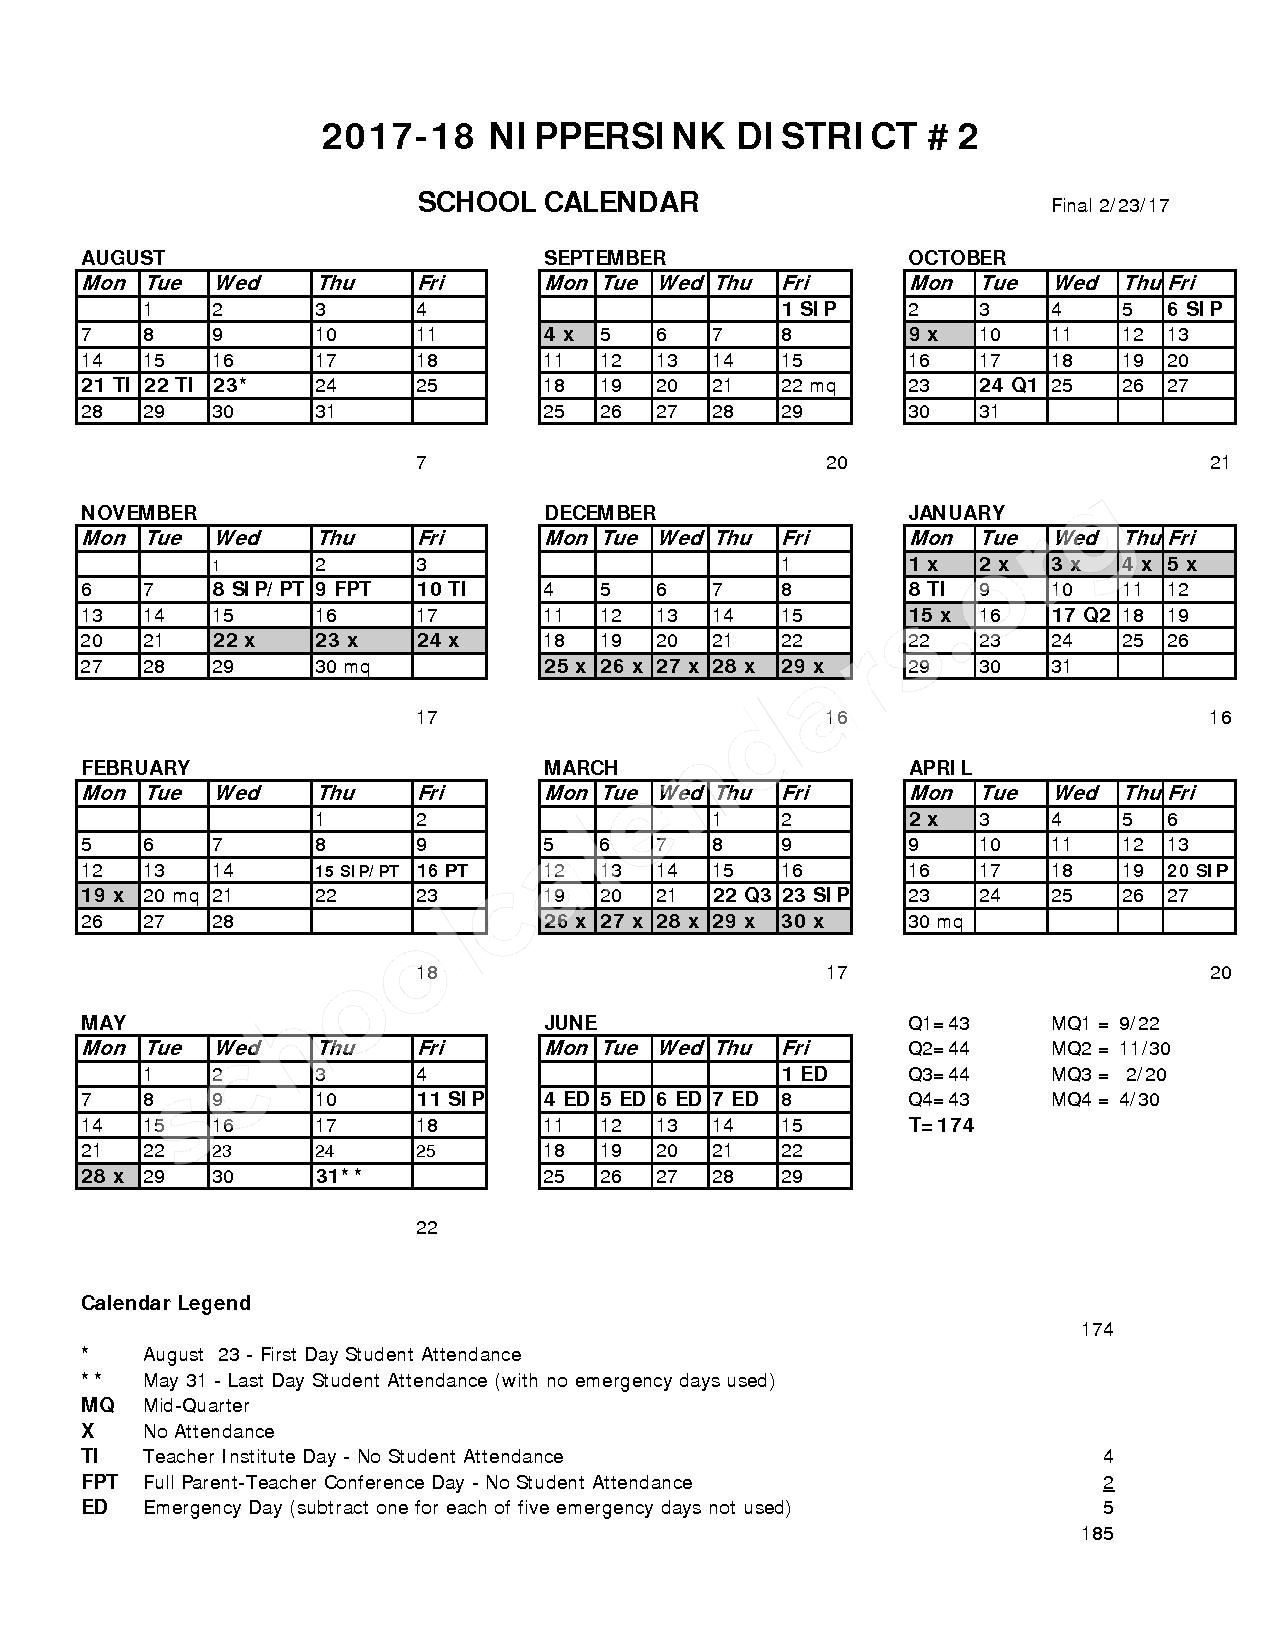 2017 - 2018 District Calendar – Nippersink School District 2 – page 1